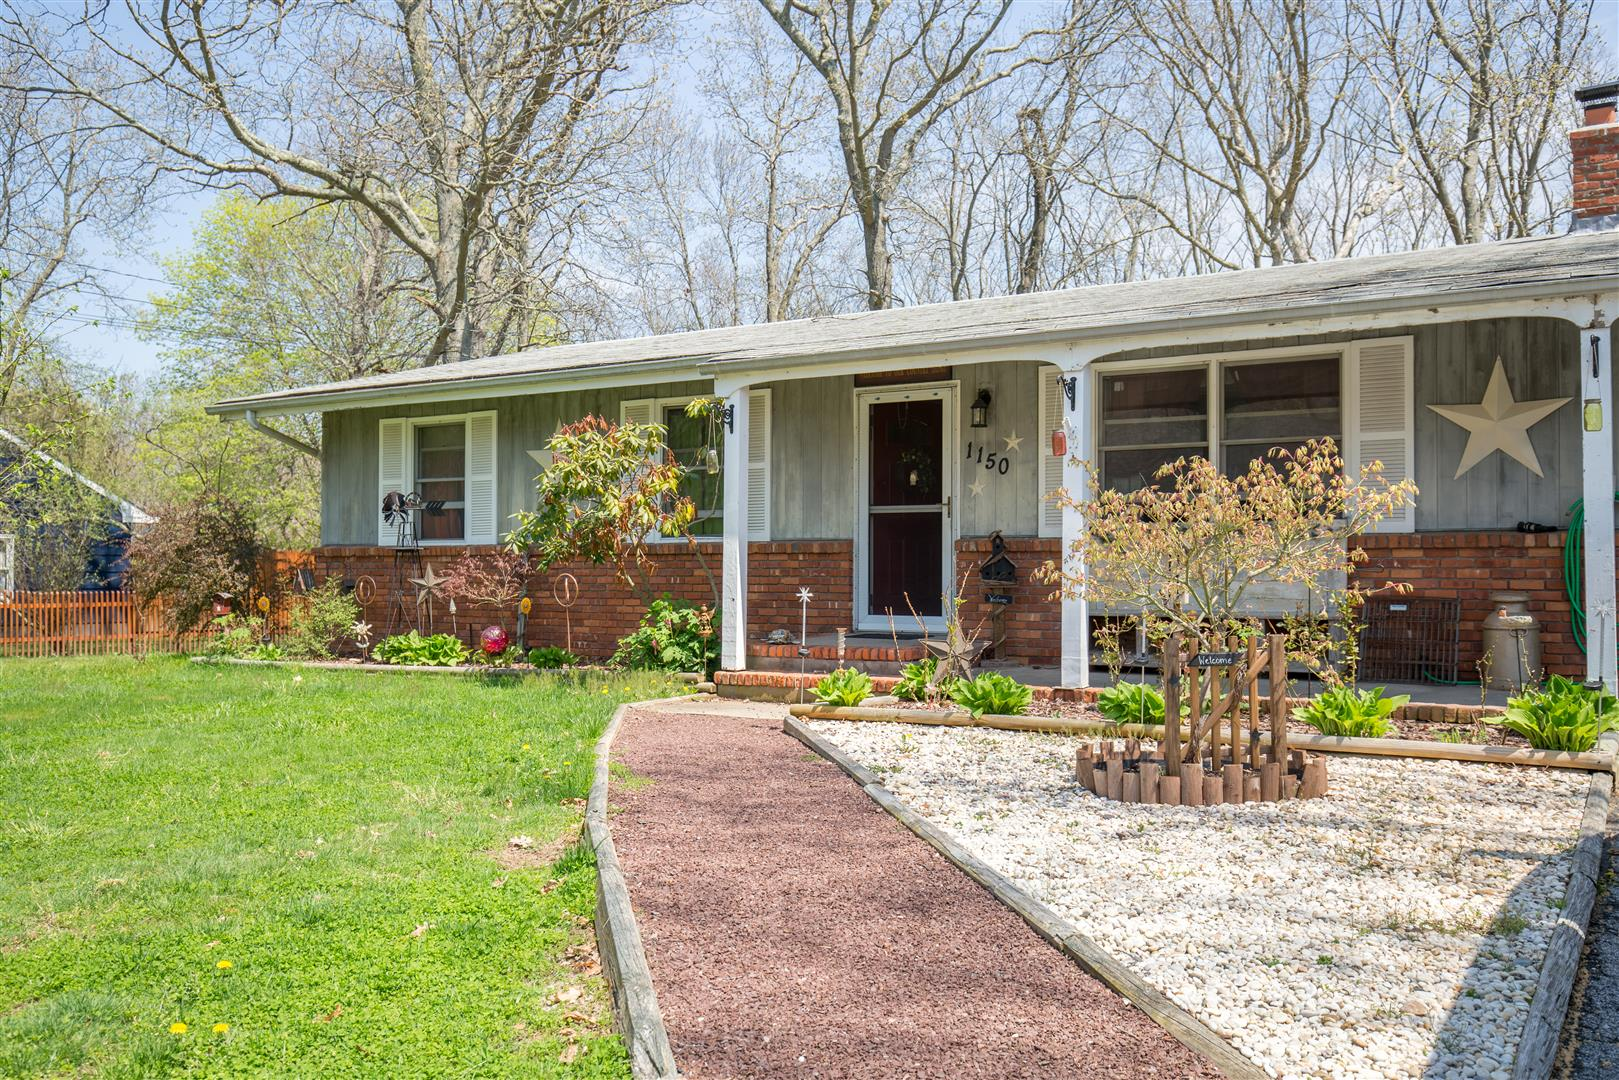 獨棟家庭住宅 為 出售 在 Ranch 1150 Seawood Dr Southold, 紐約州, 11971 美國